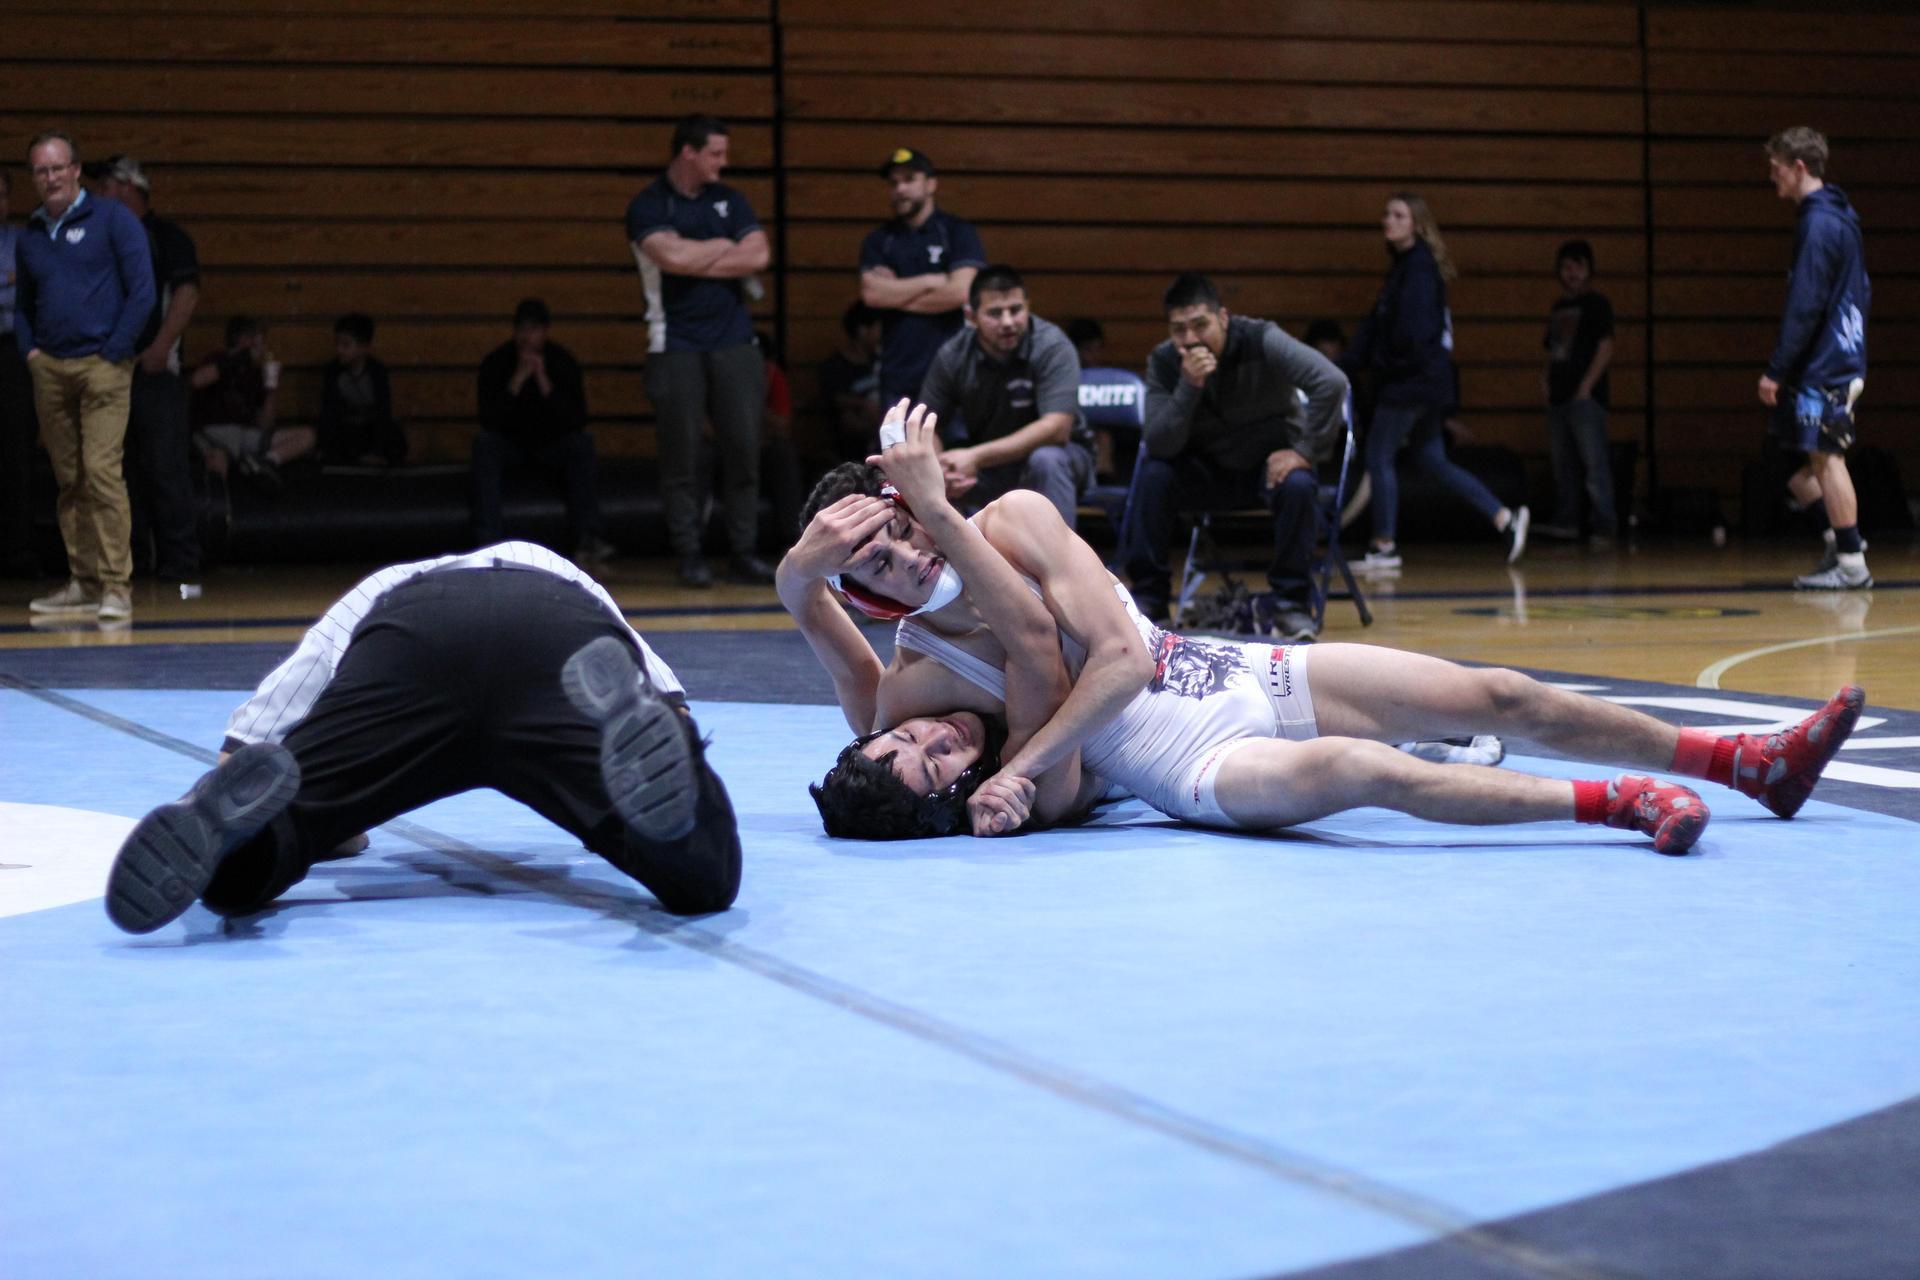 Chowchilla high wrestlers at league finals